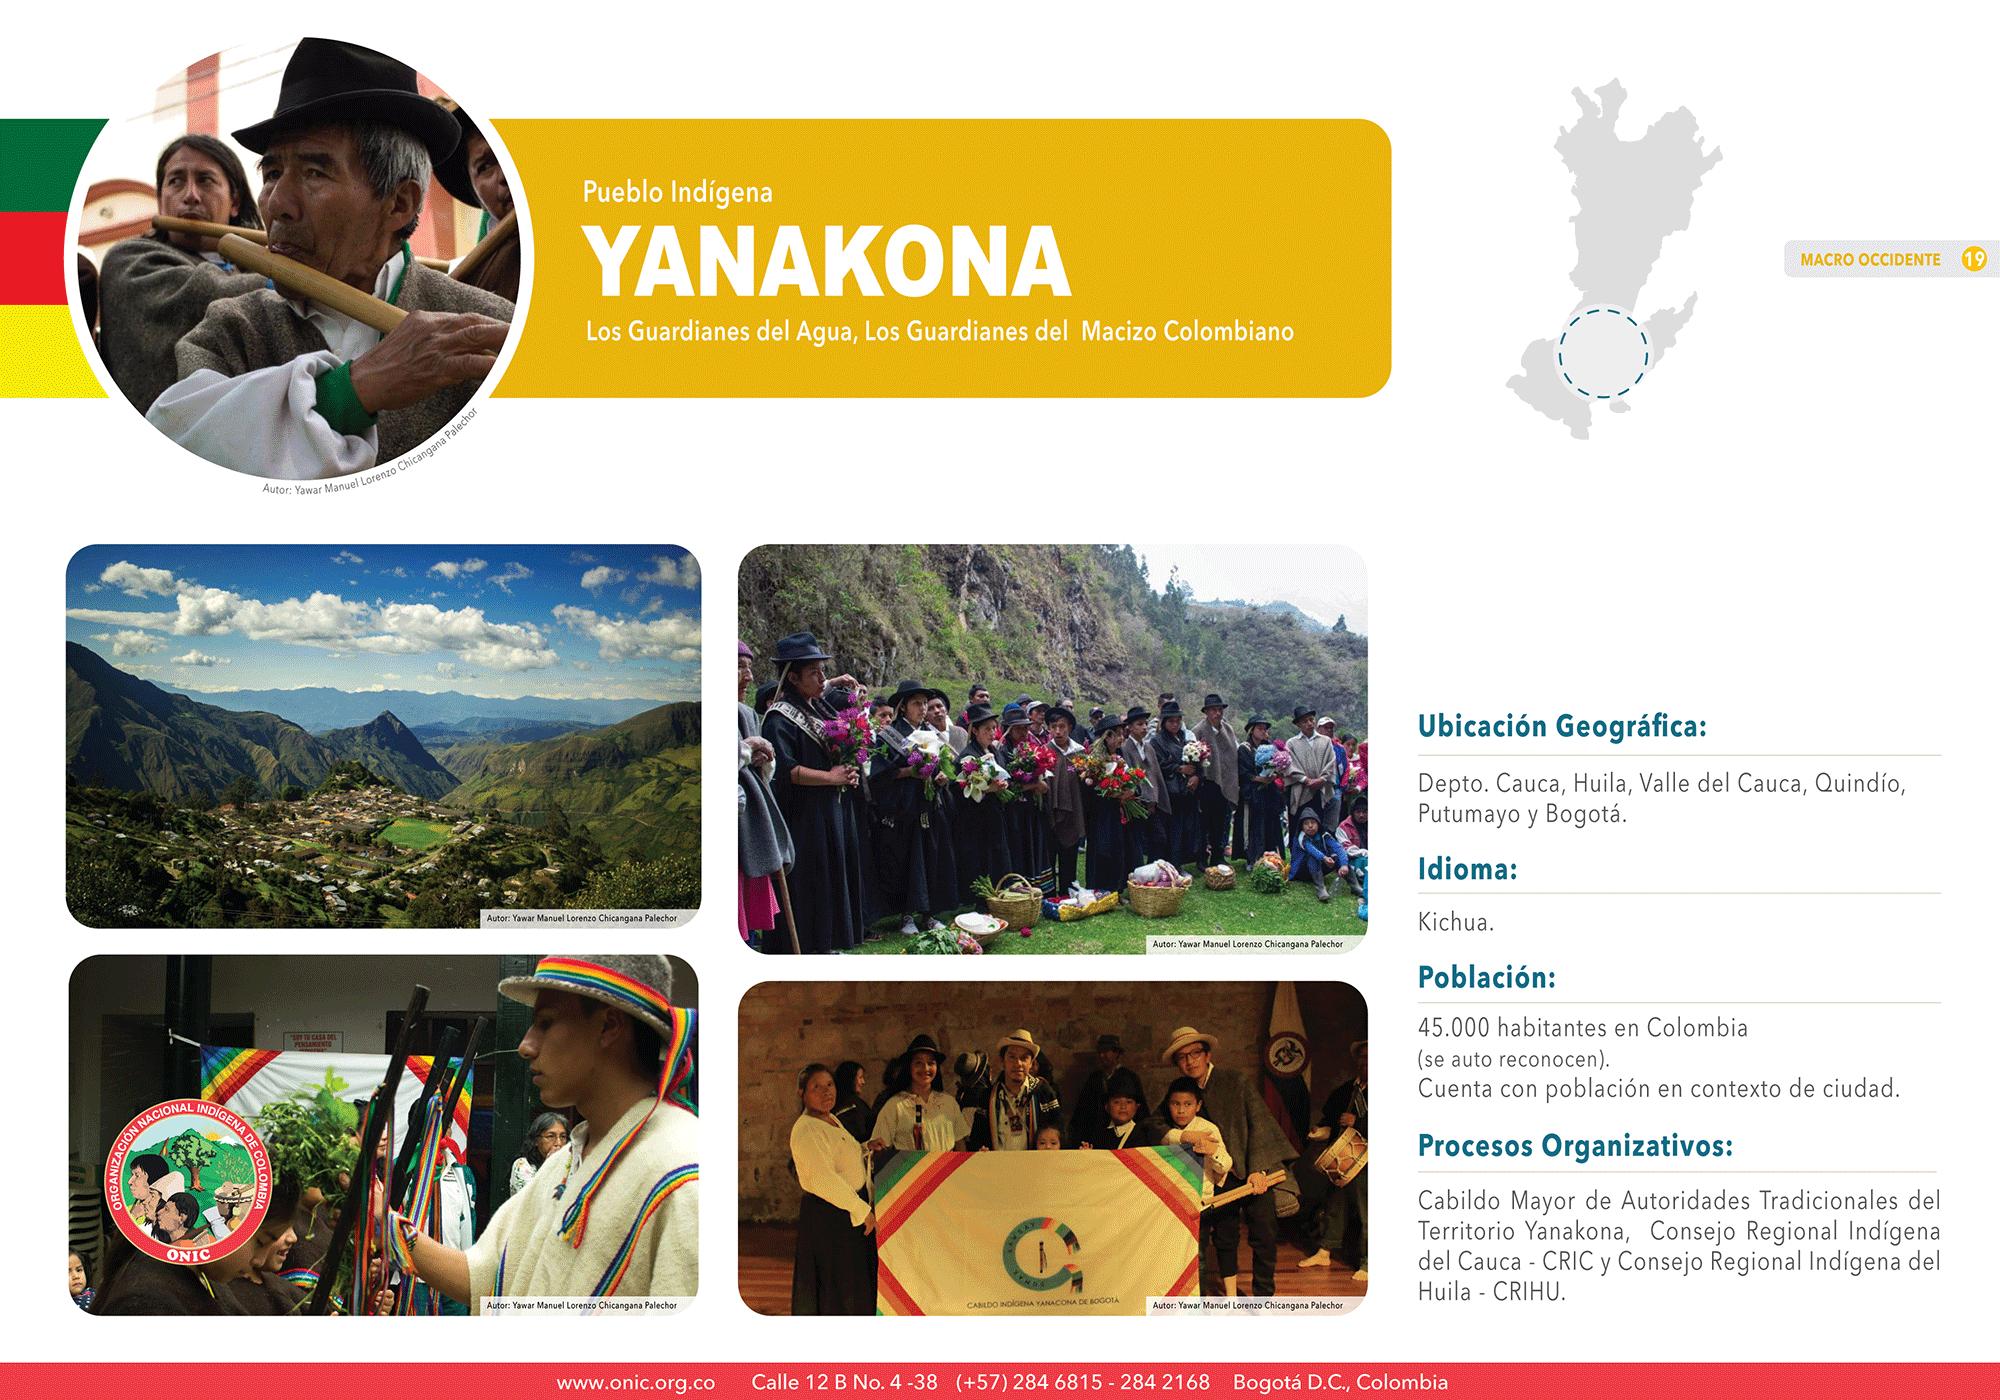 19-YANAKONA-FichaDigital-PueblosIndígenas-ONIC-01